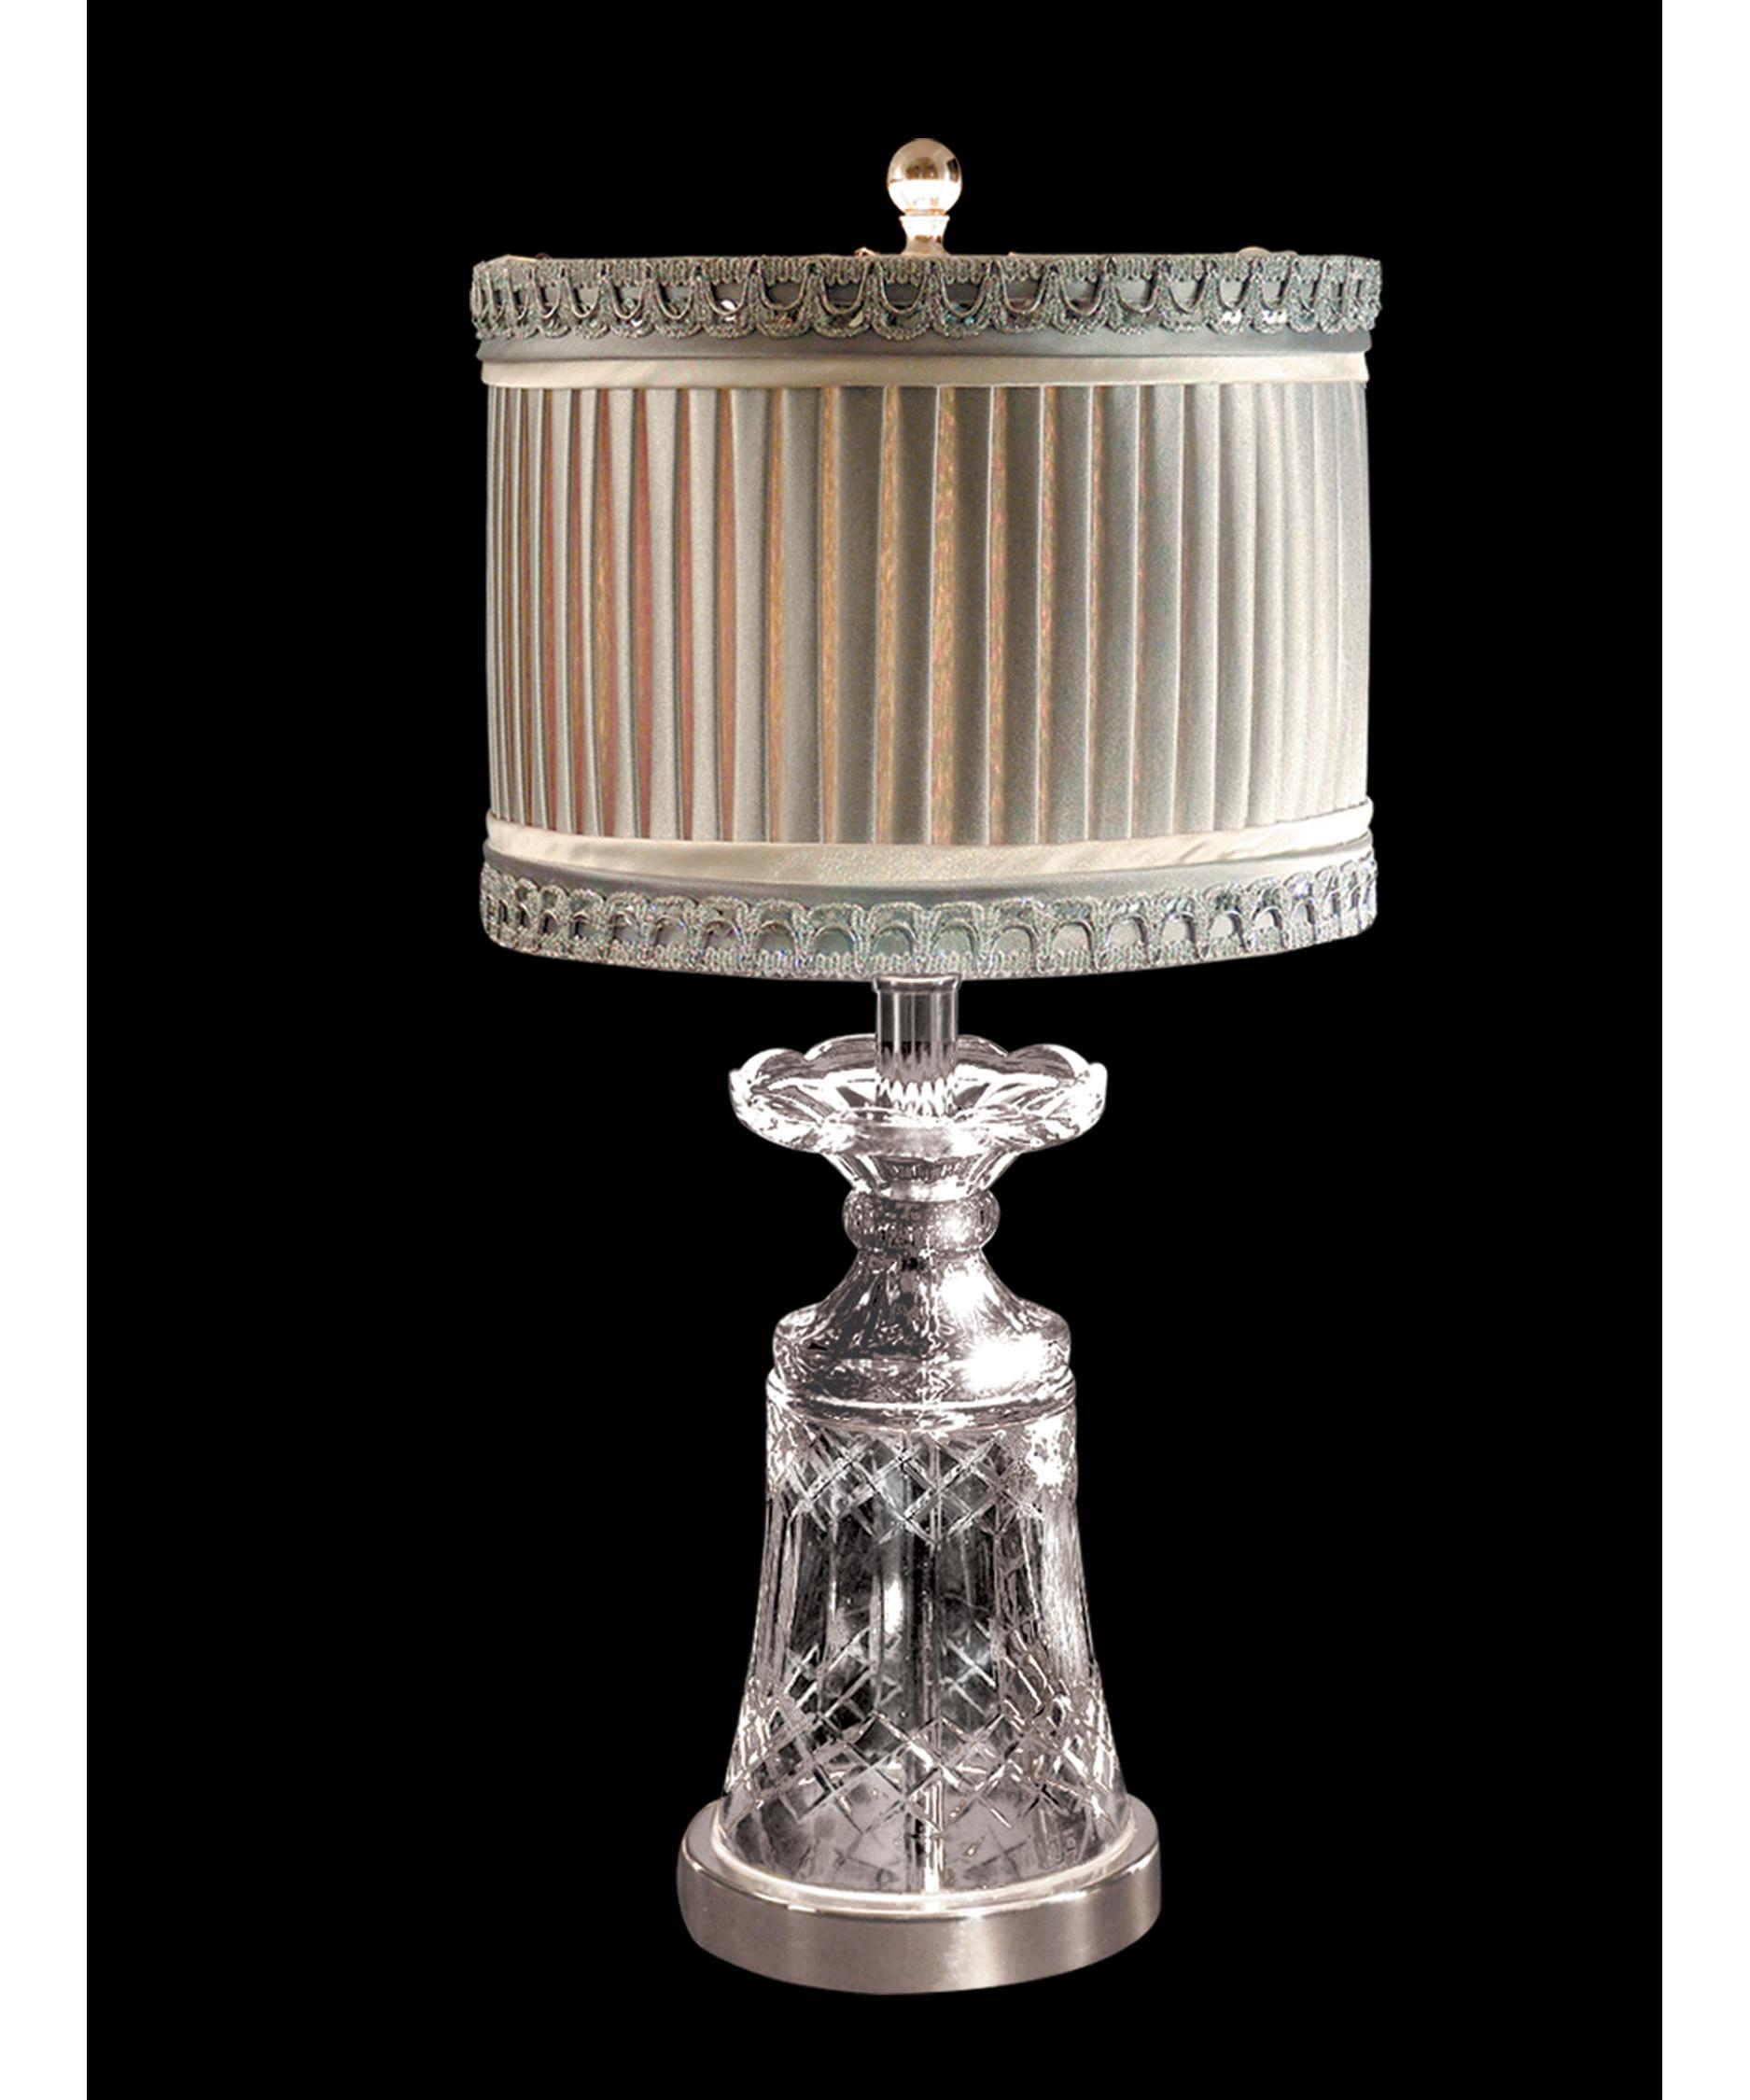 dale tiffany lamps photo - 7